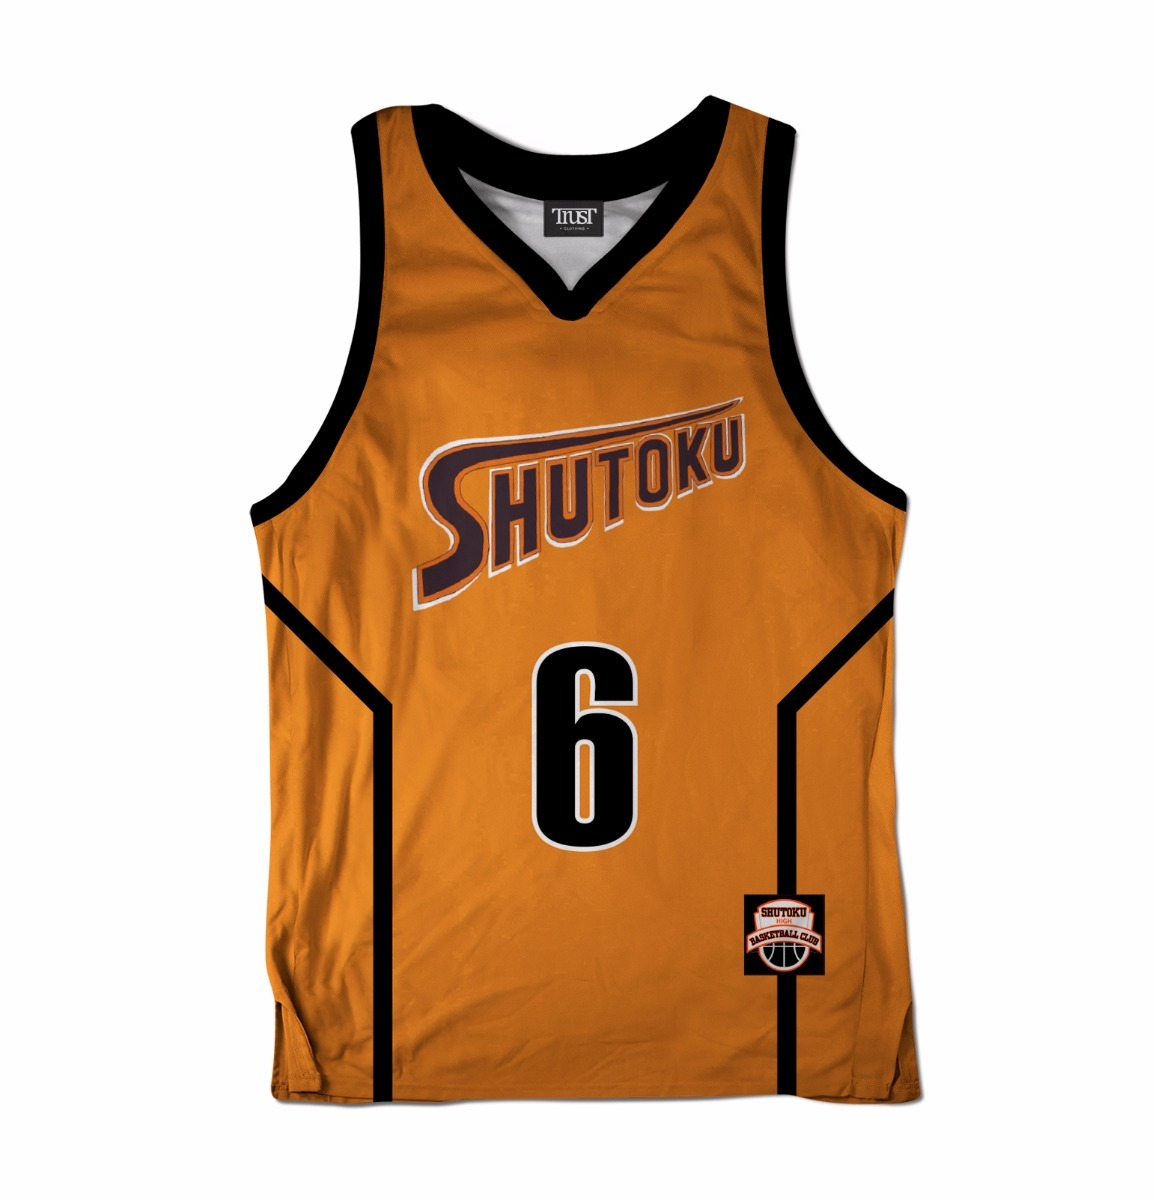 d35949b38 camiseta regata kuroko no basket anime basquete summer geek. Carregando zoom .